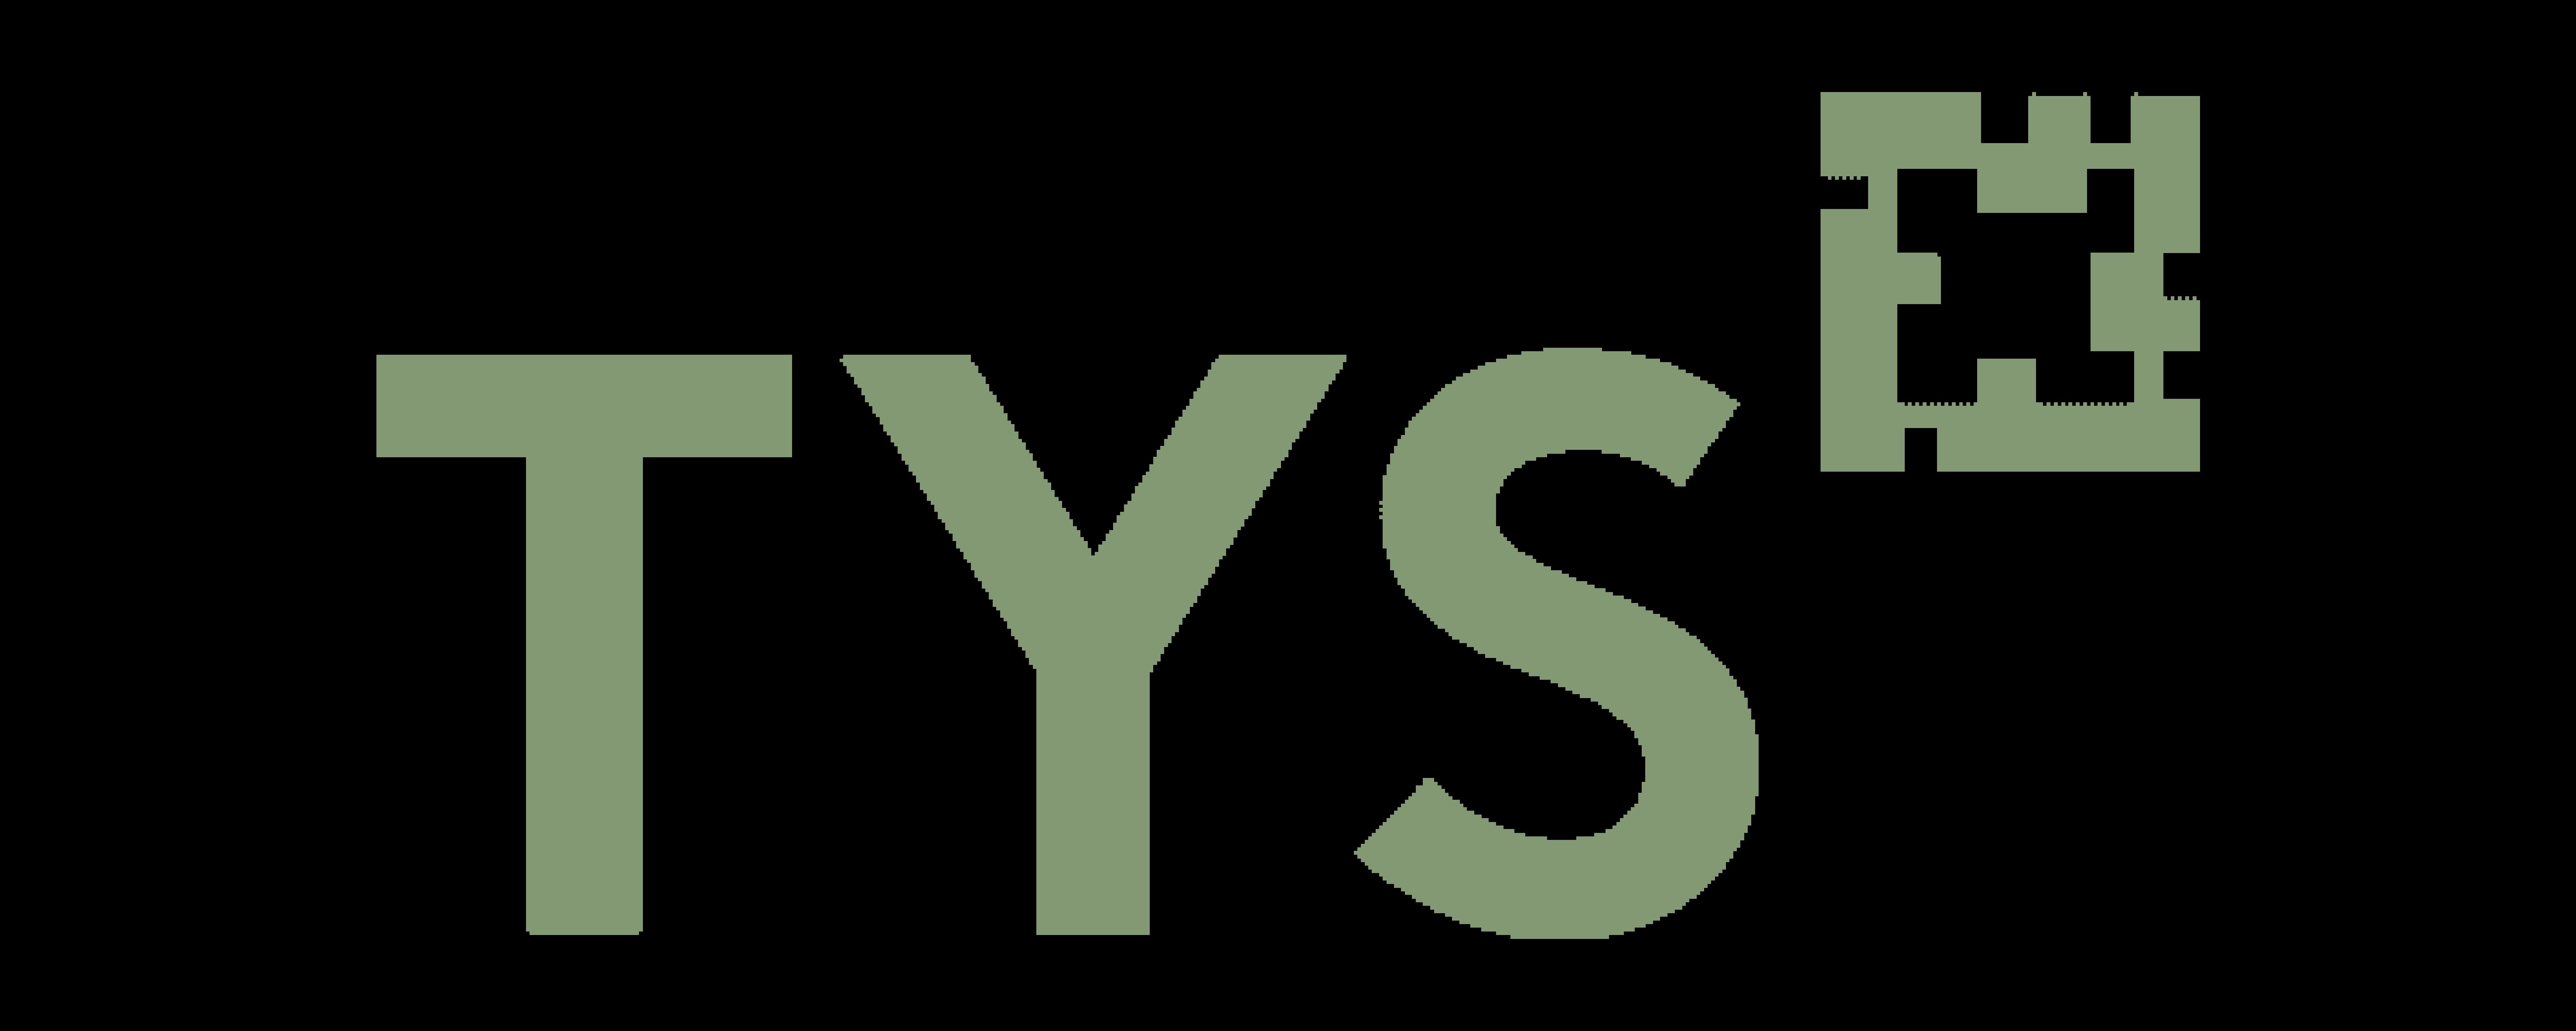 tys-getjenny-logo